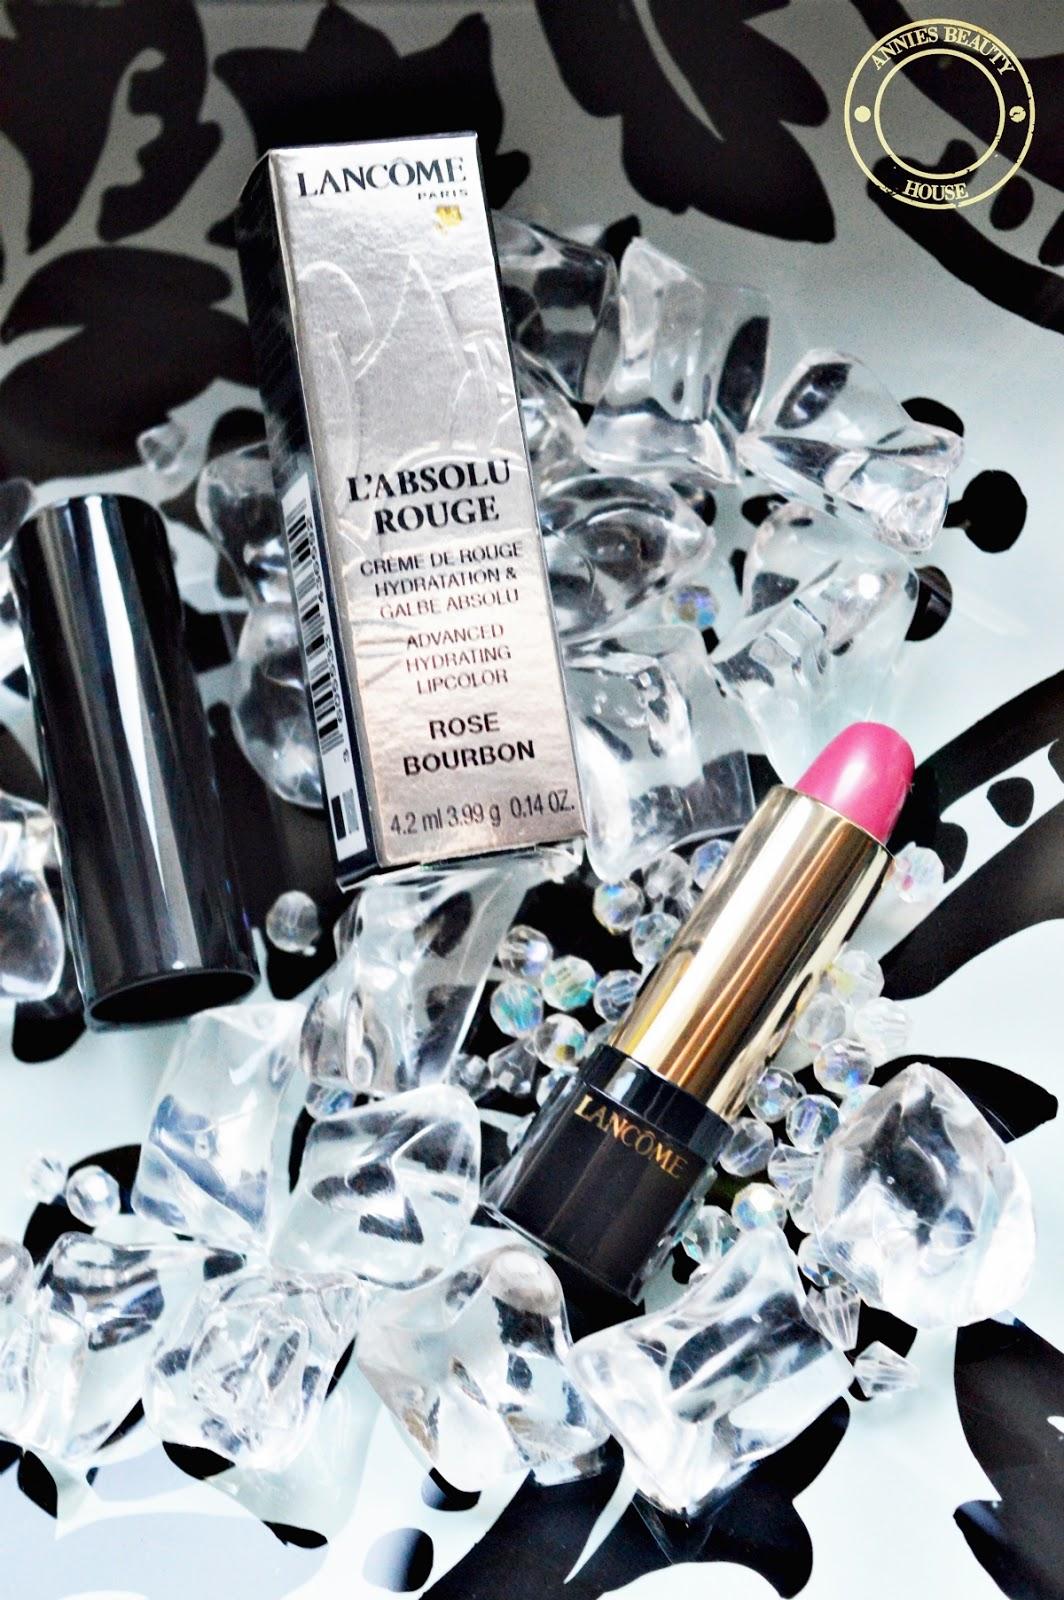 LANCÔME L'Absolu Rouge Rose Bourbon 257 - open lipstick